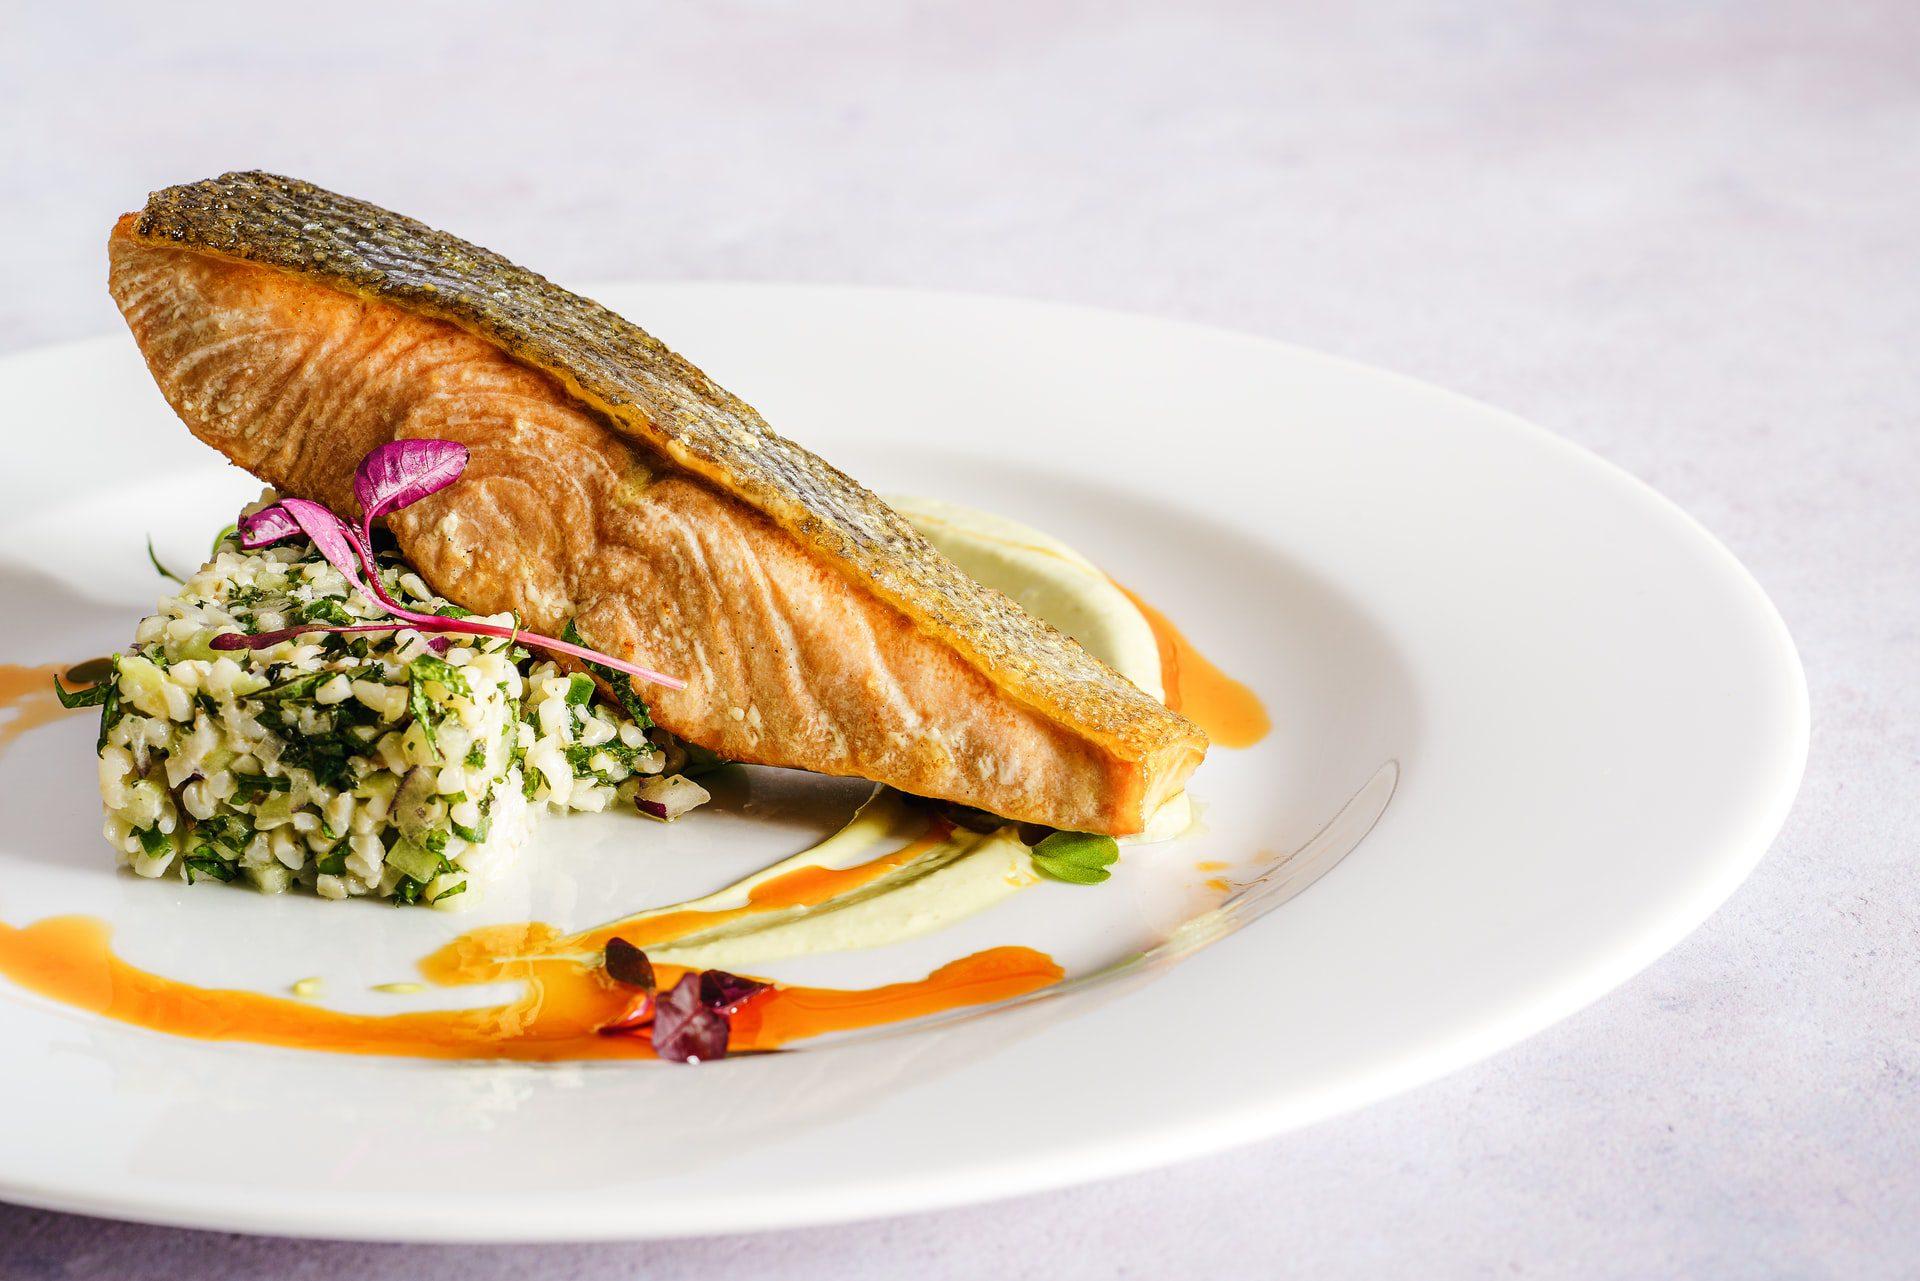 Alaska ski resort chef enters national seafood cook-off